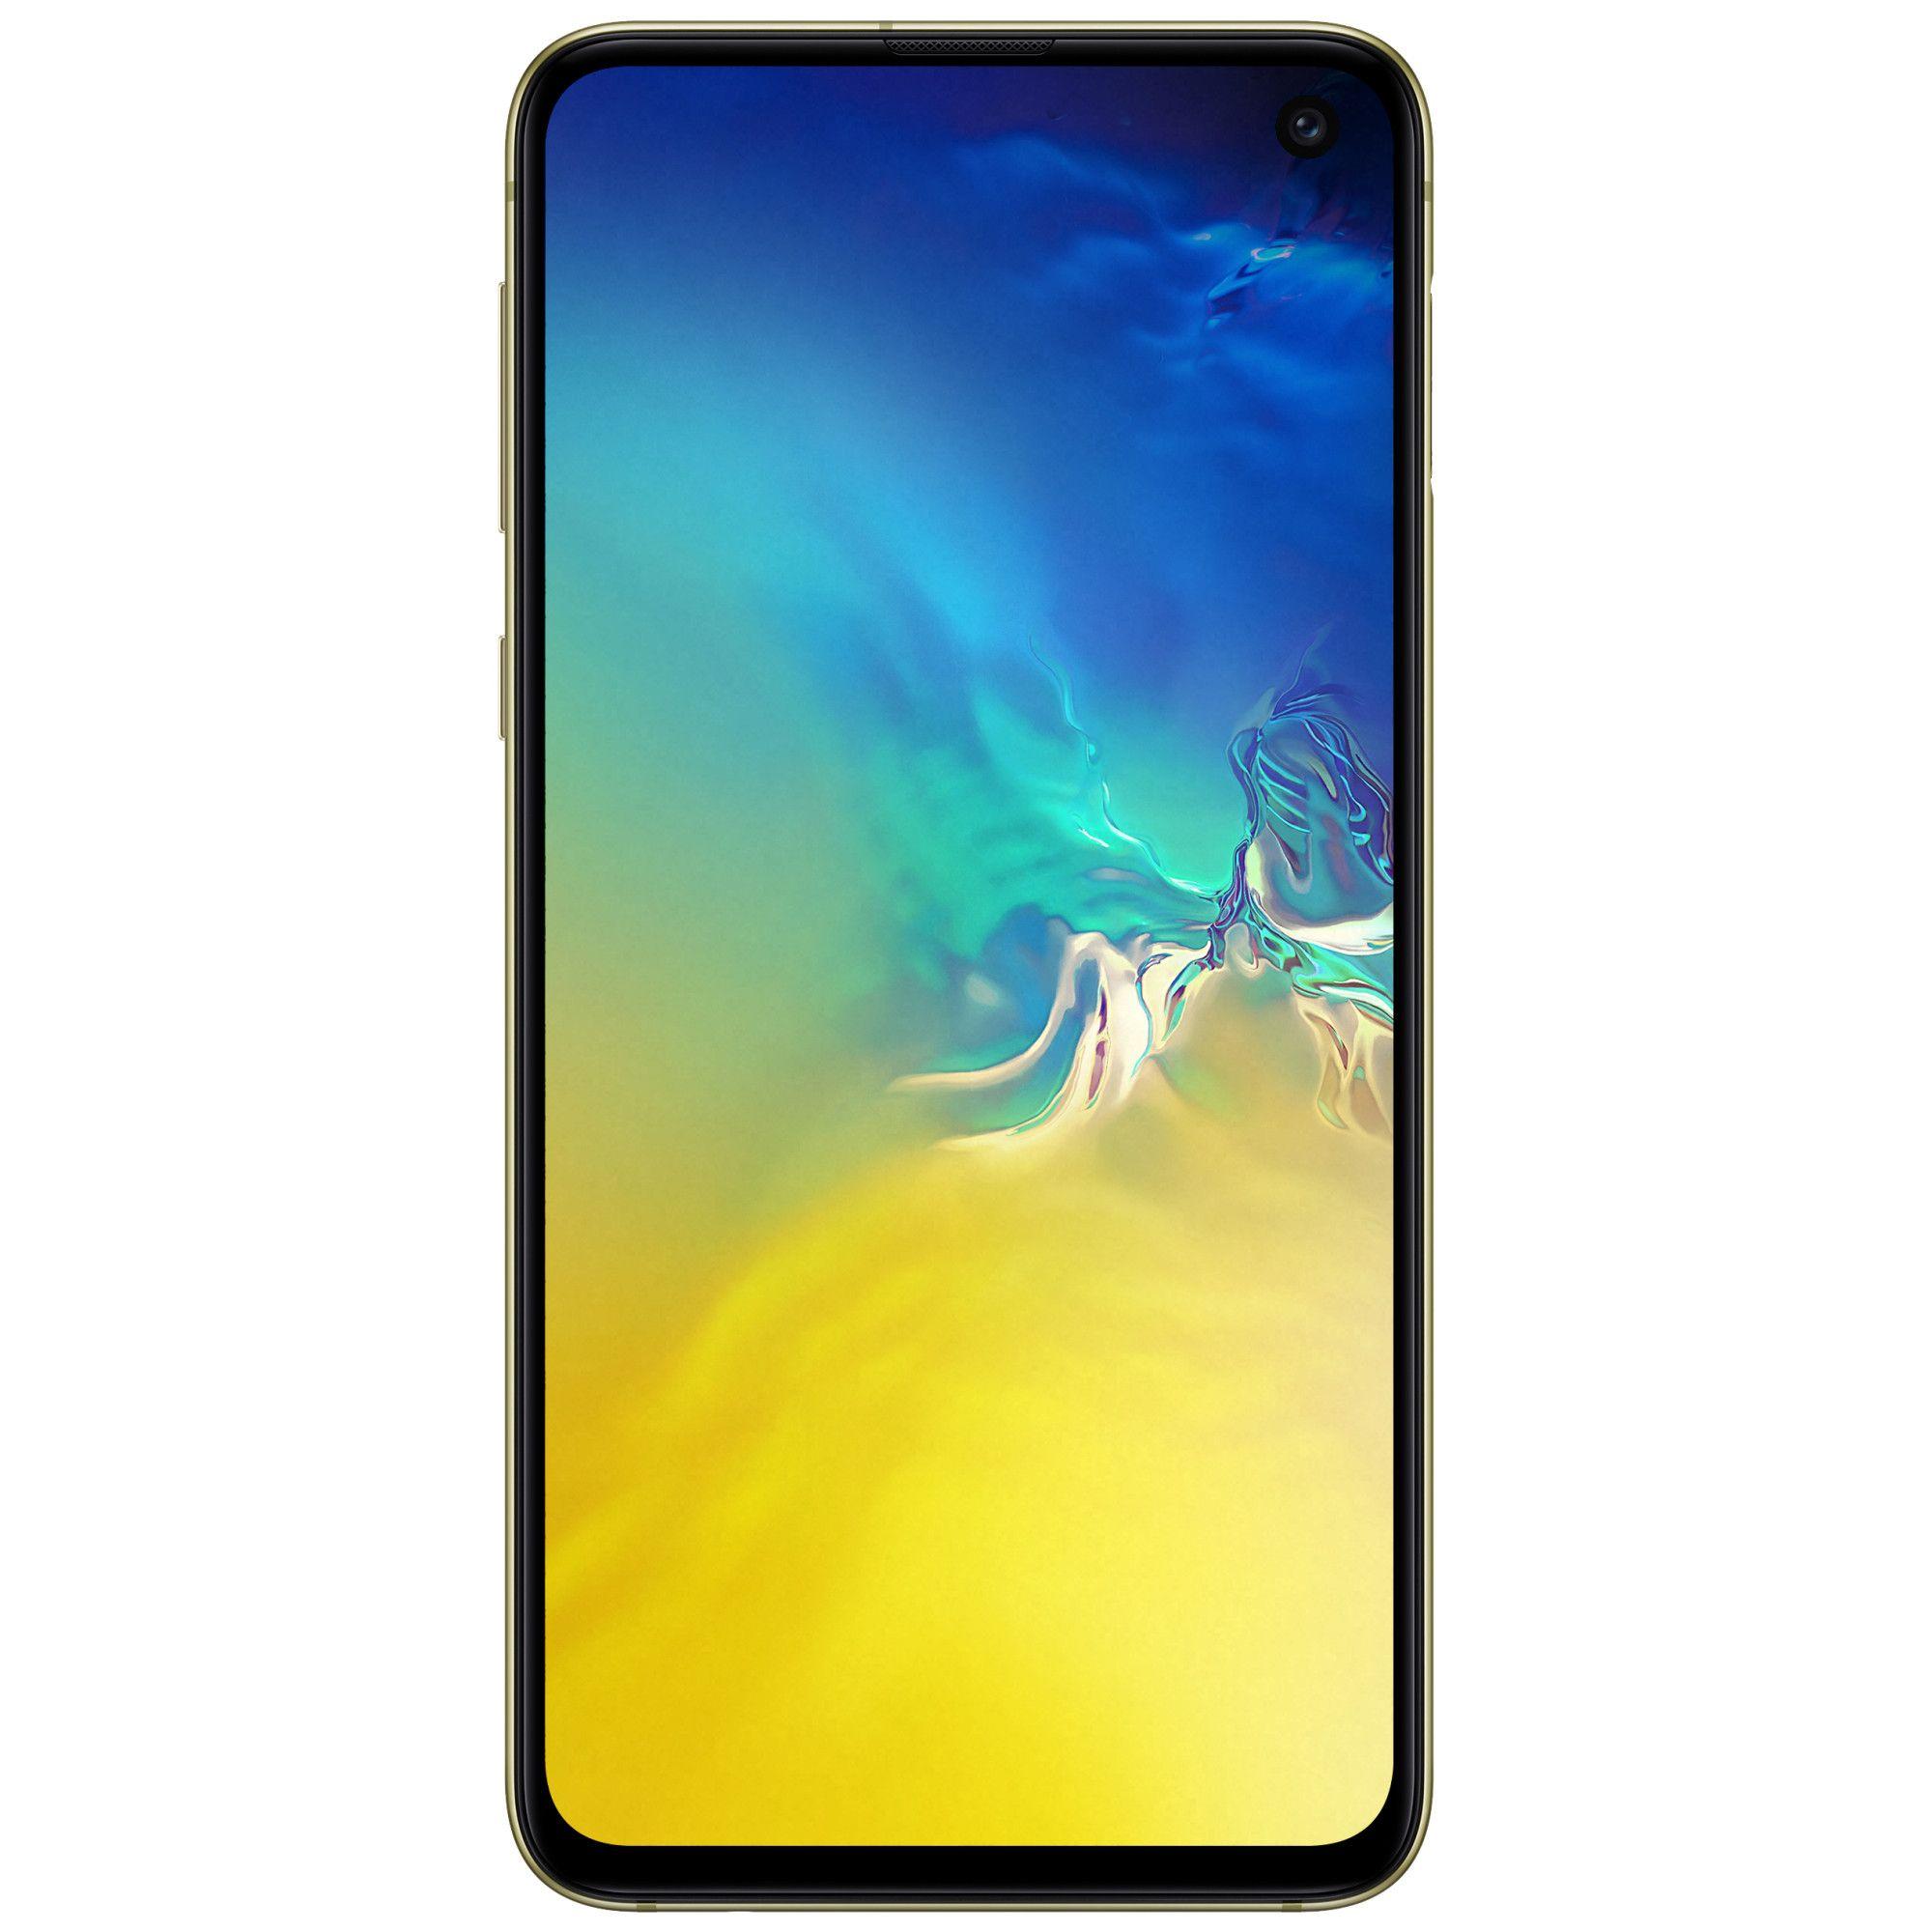 Telefon Mobil Samsung Galaxy S10e G970 128GB Flash 6GB RAM Dual SIM 4G Canary Yellow